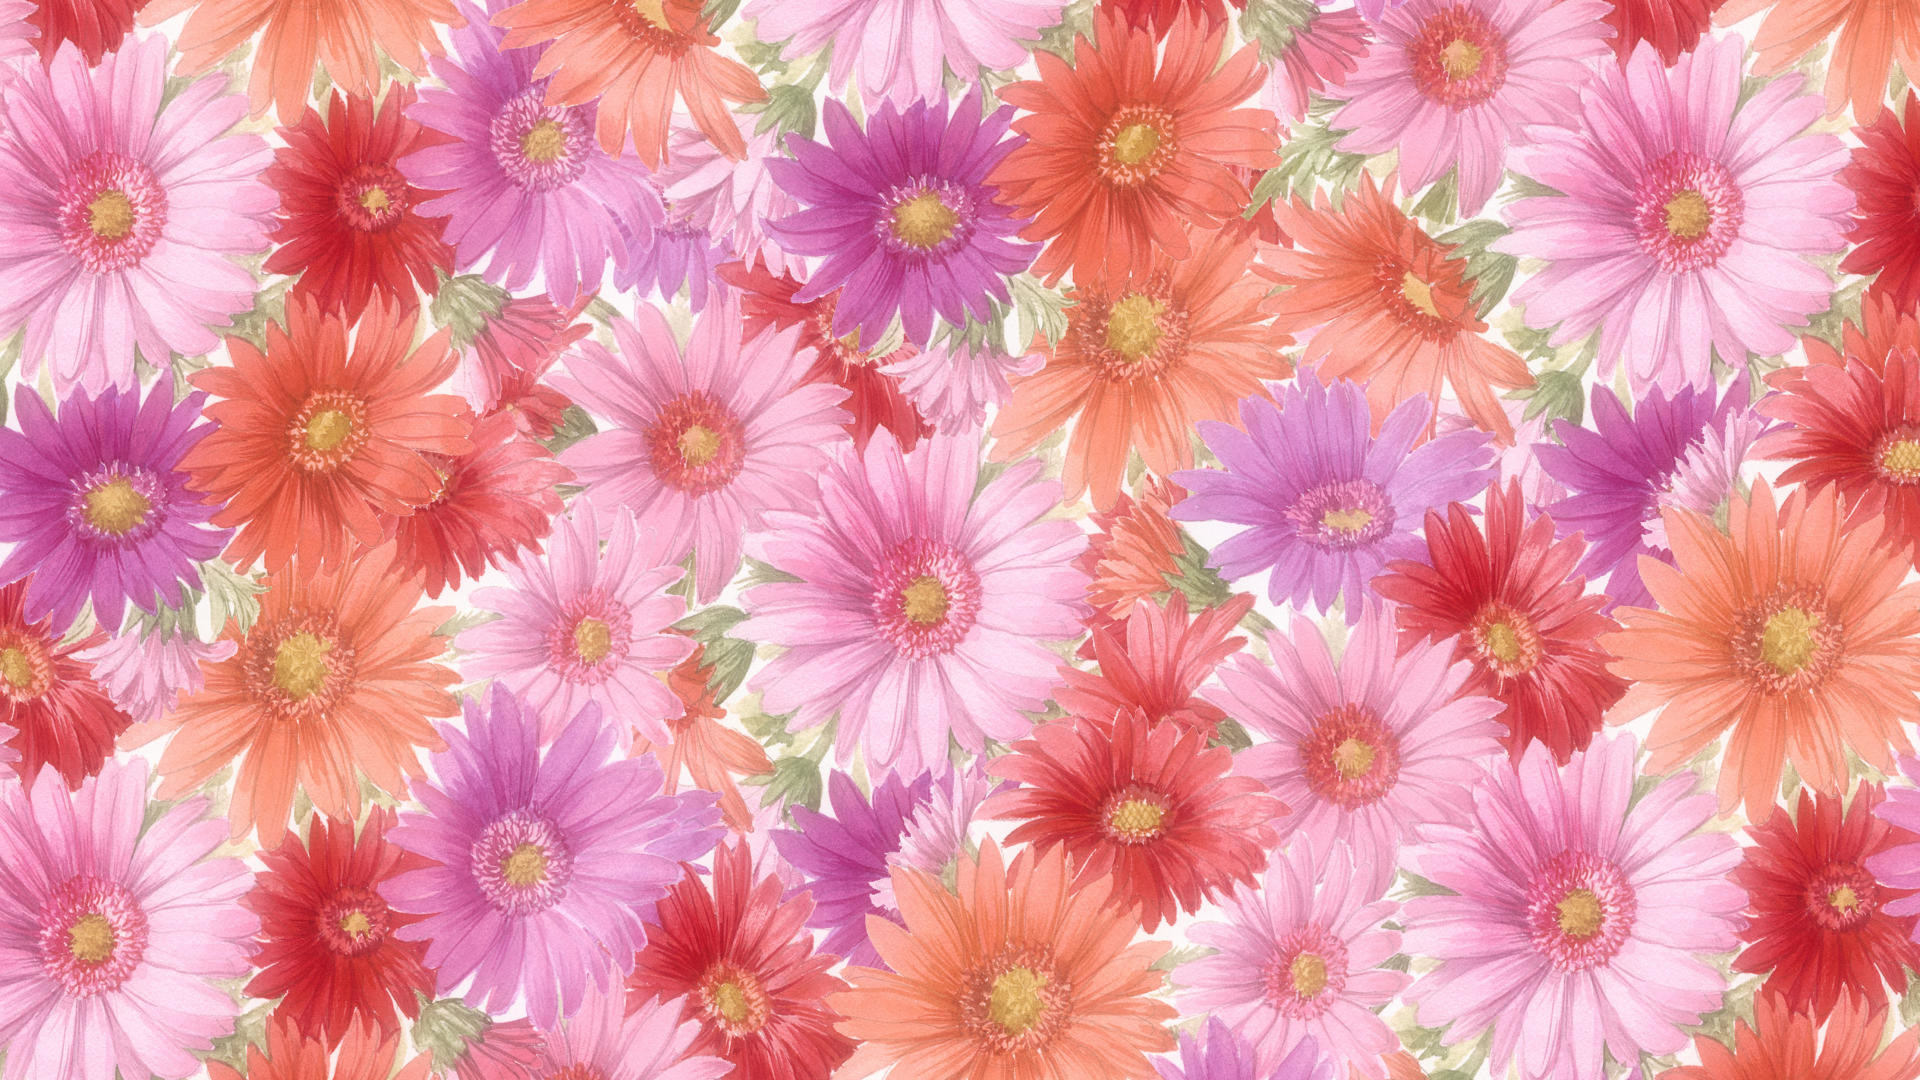 Flowers background | Flower wallpaper | images of flower | #18